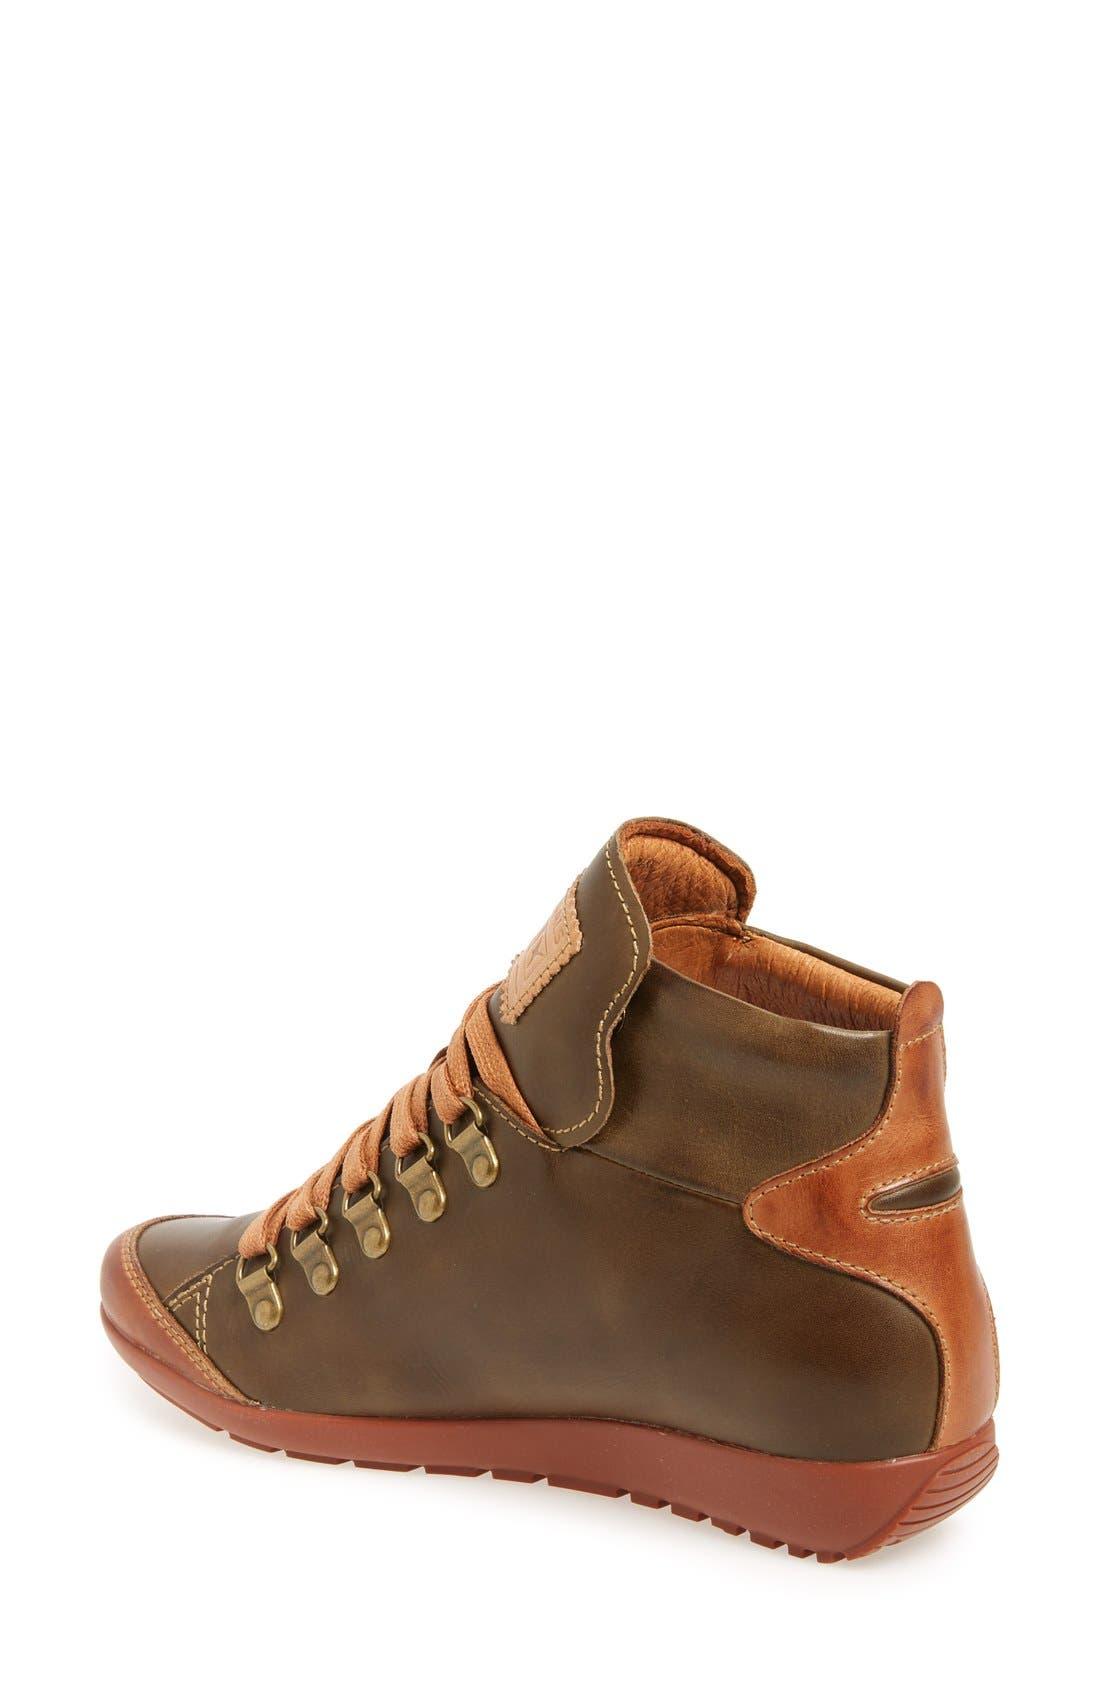 Lisboa High Top Sneaker,                             Alternate thumbnail 2, color,                             Moss Leather